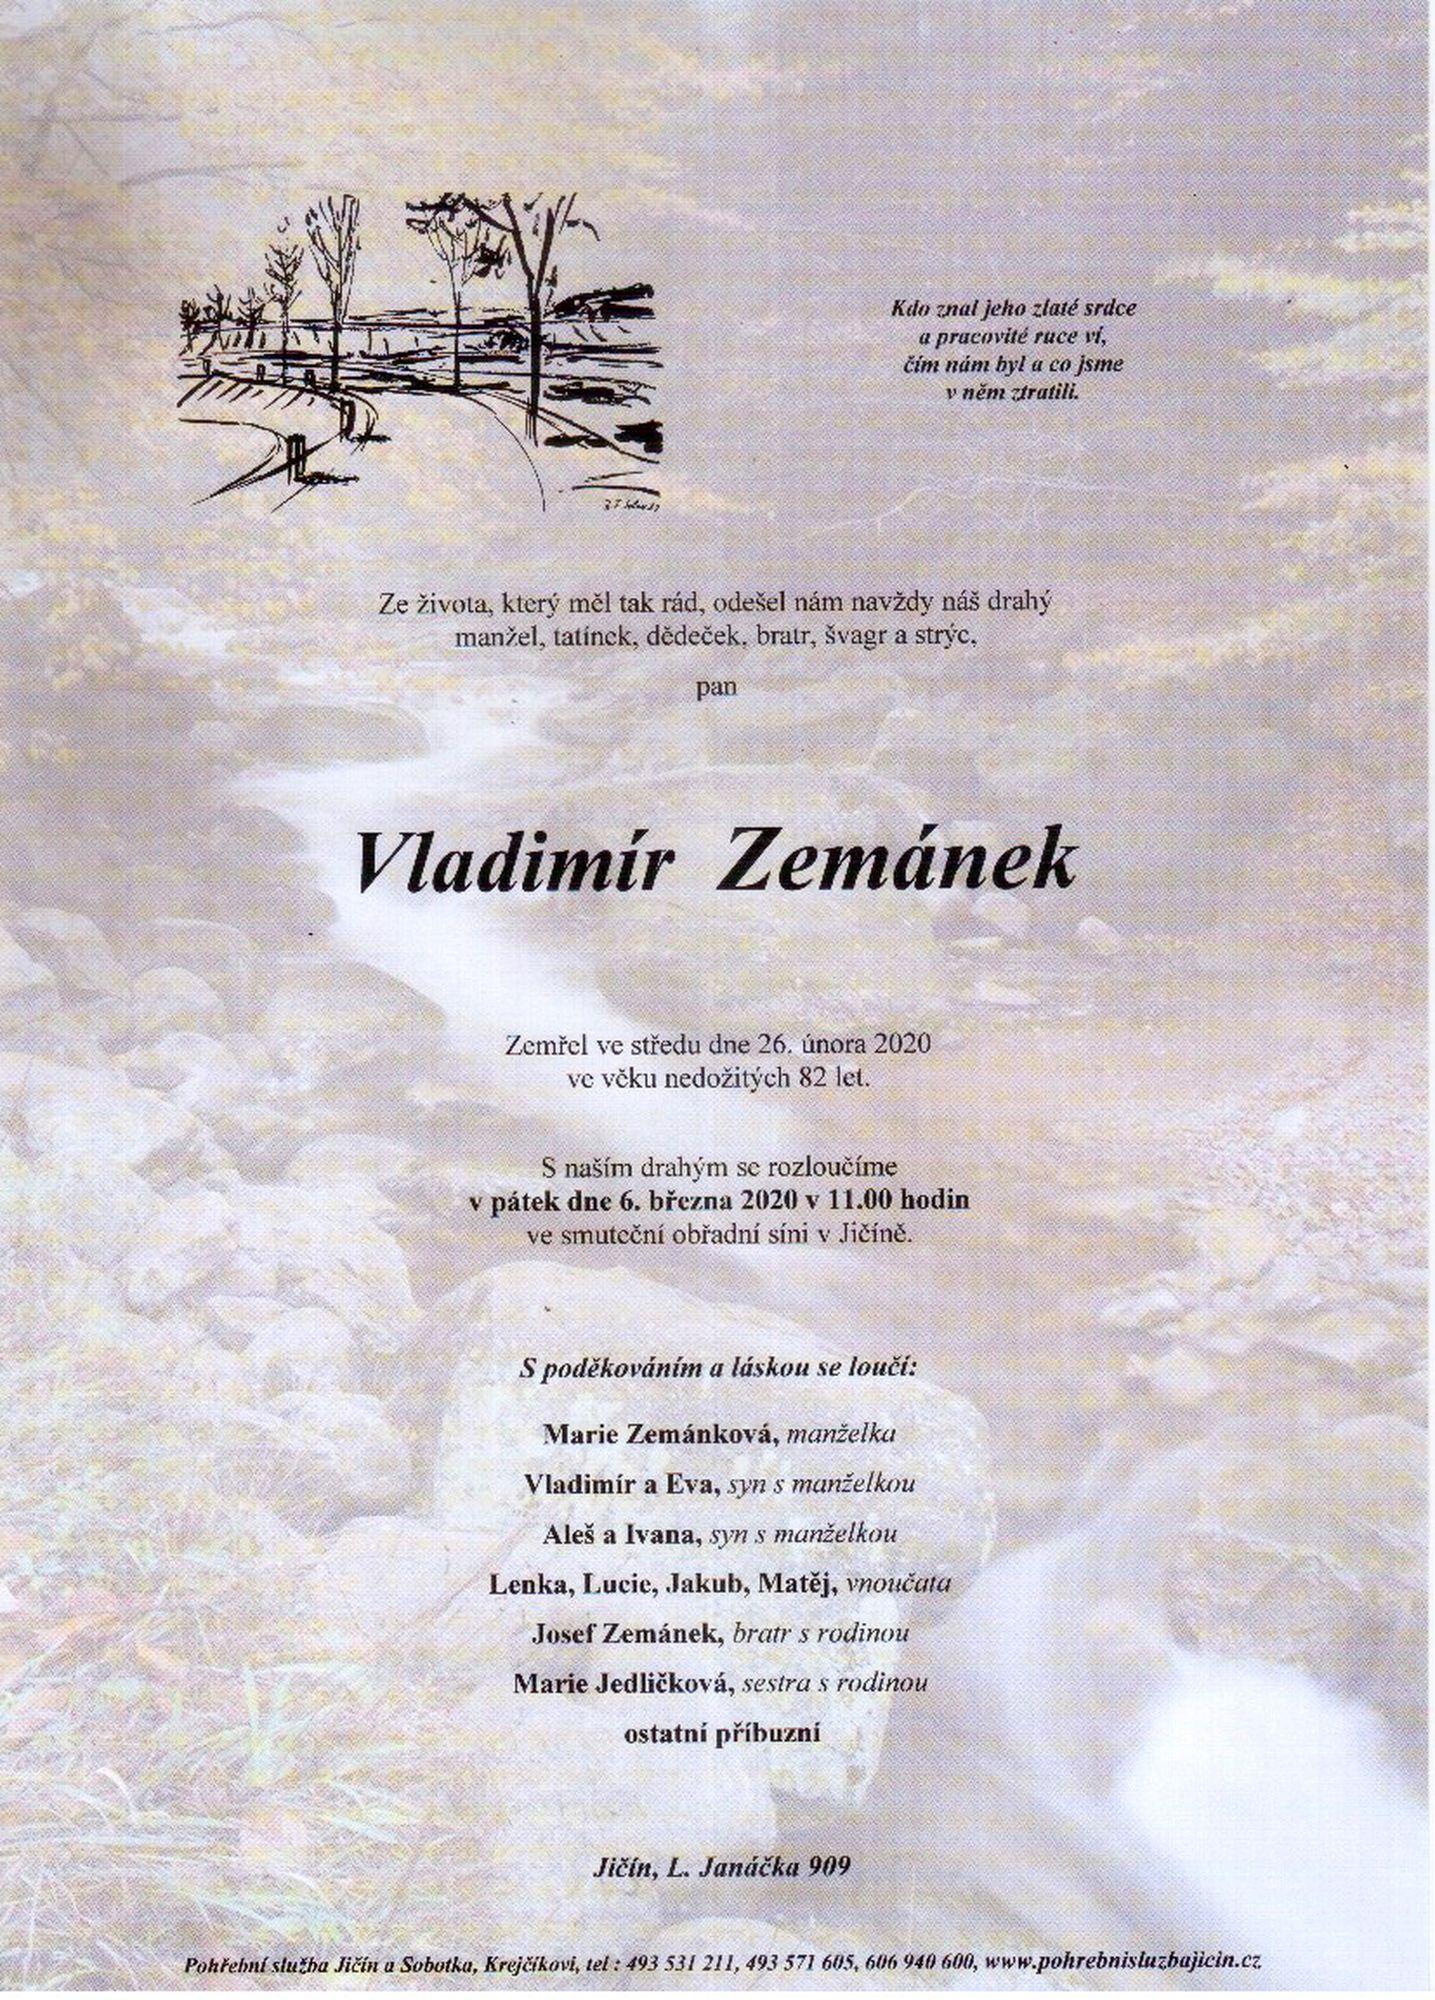 Vladimír Zemánek